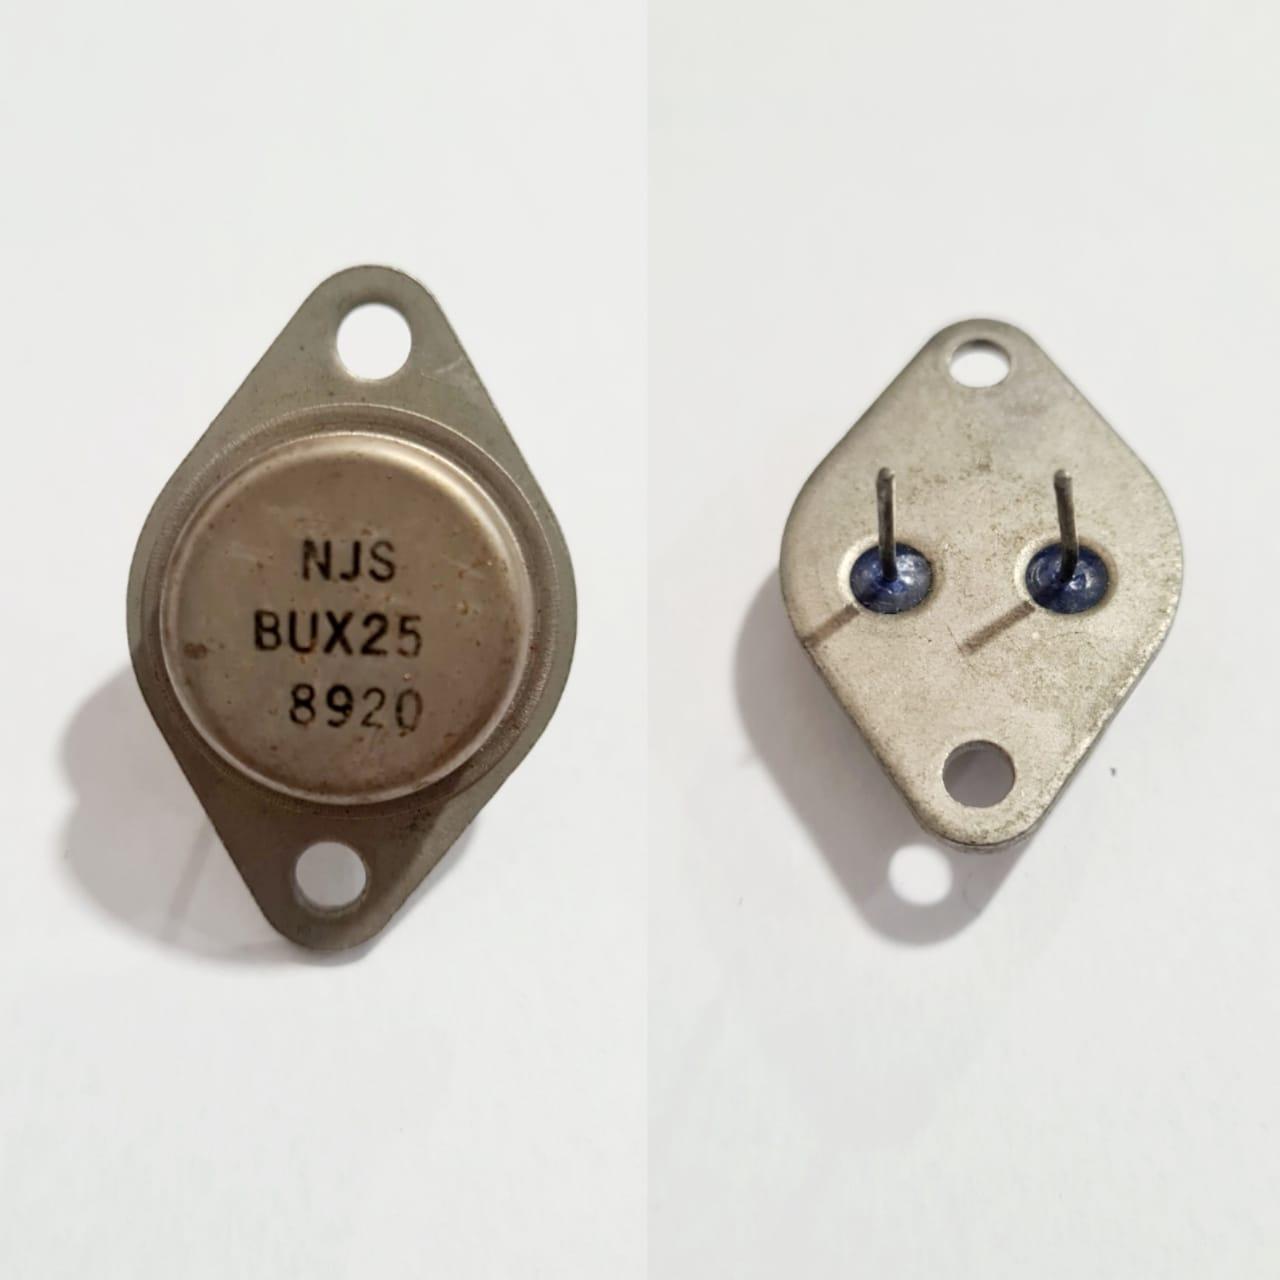 Transistor BUX25 TRANS 89